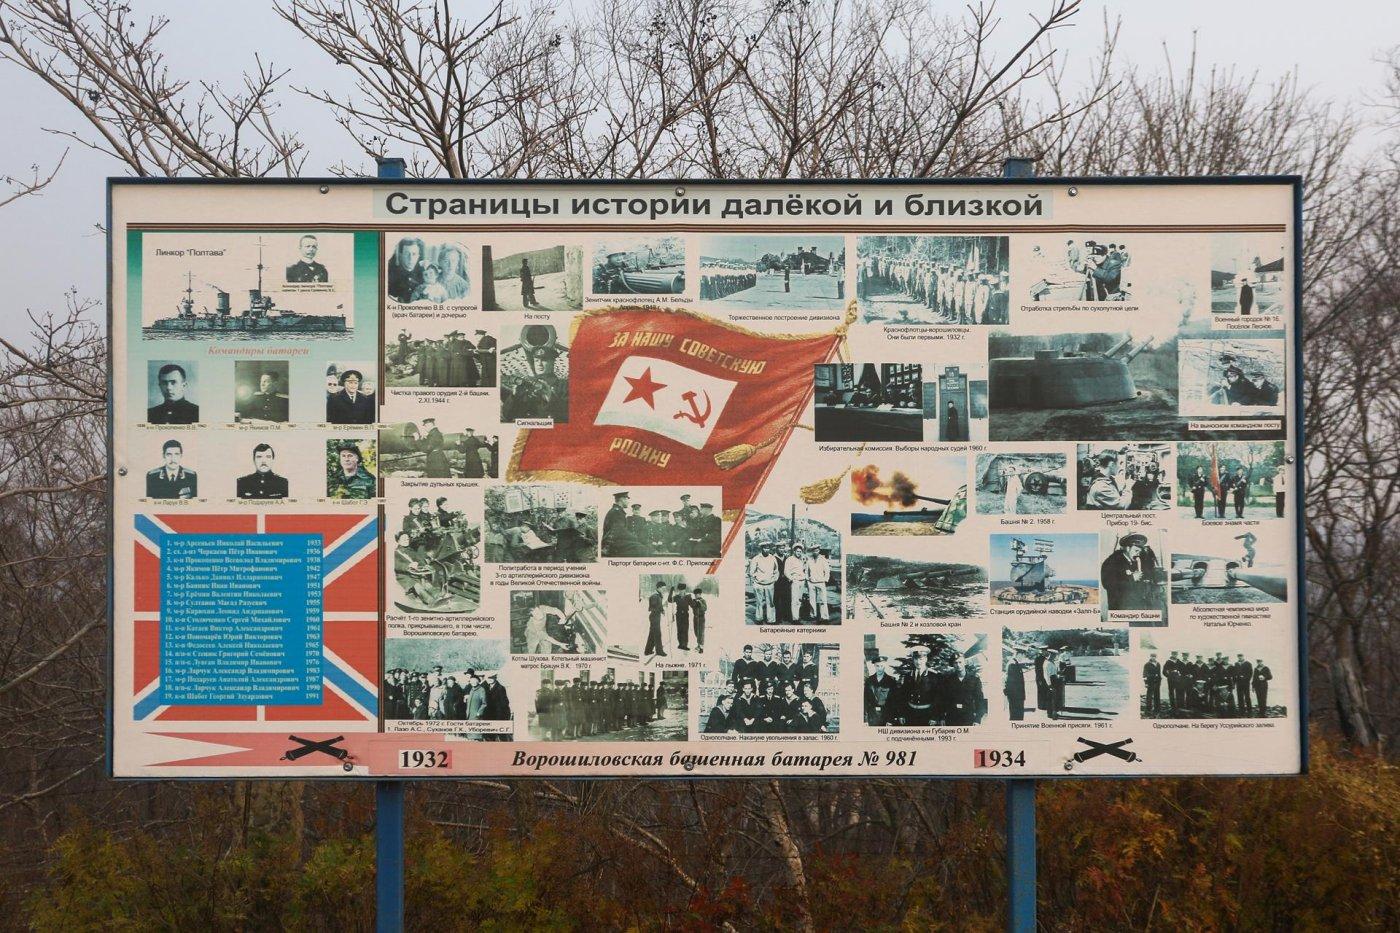 Фото 9658 (Copy).jpg. Россия, Приморский край, Русский, Unnamed Road